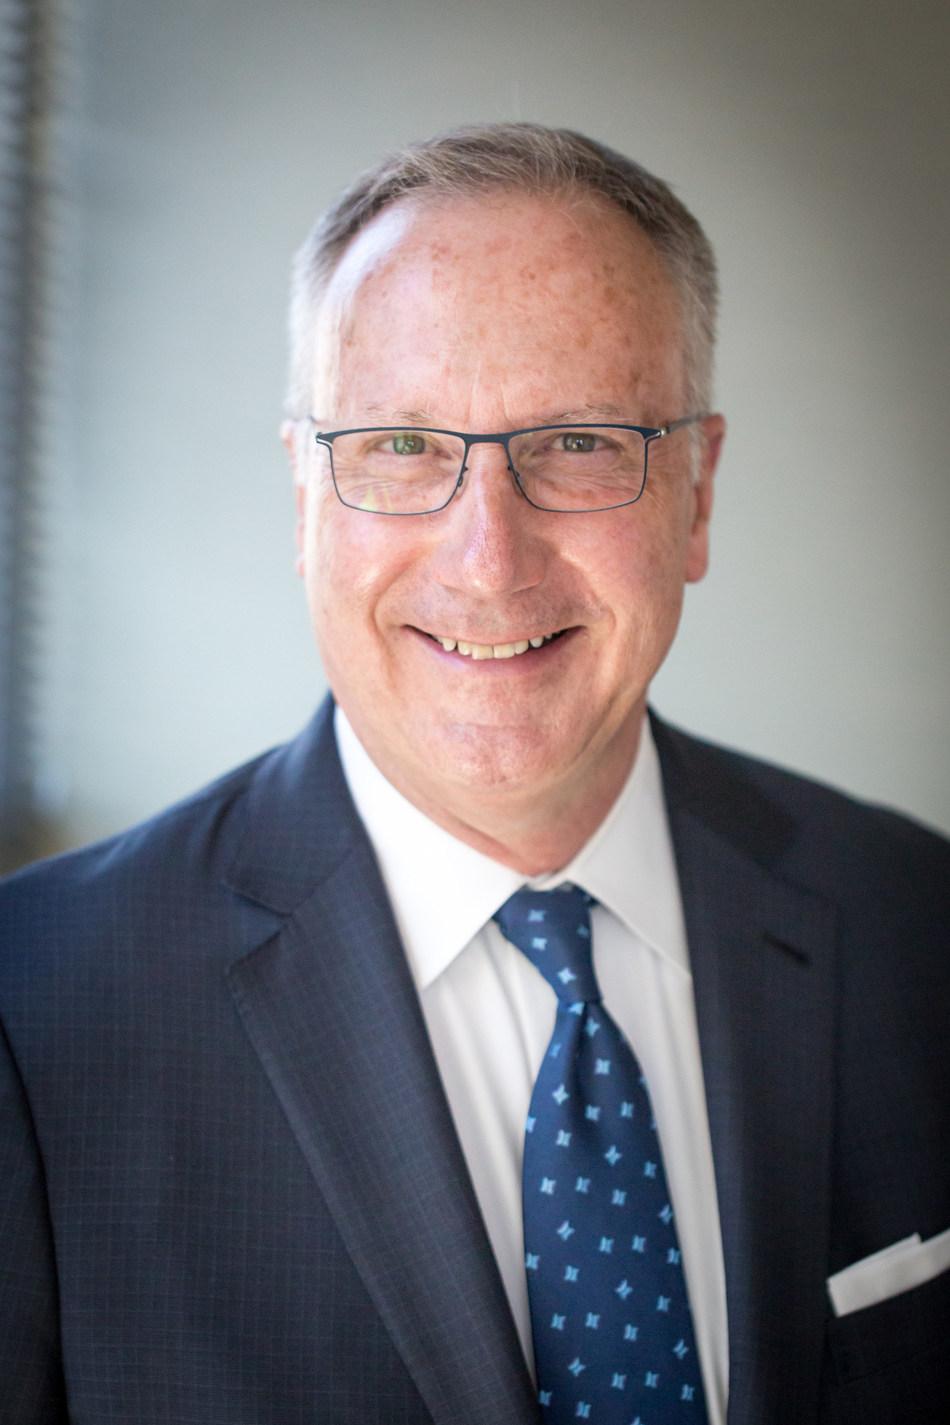 Former Deputy U.S. Trade Representative Robert Holleyman